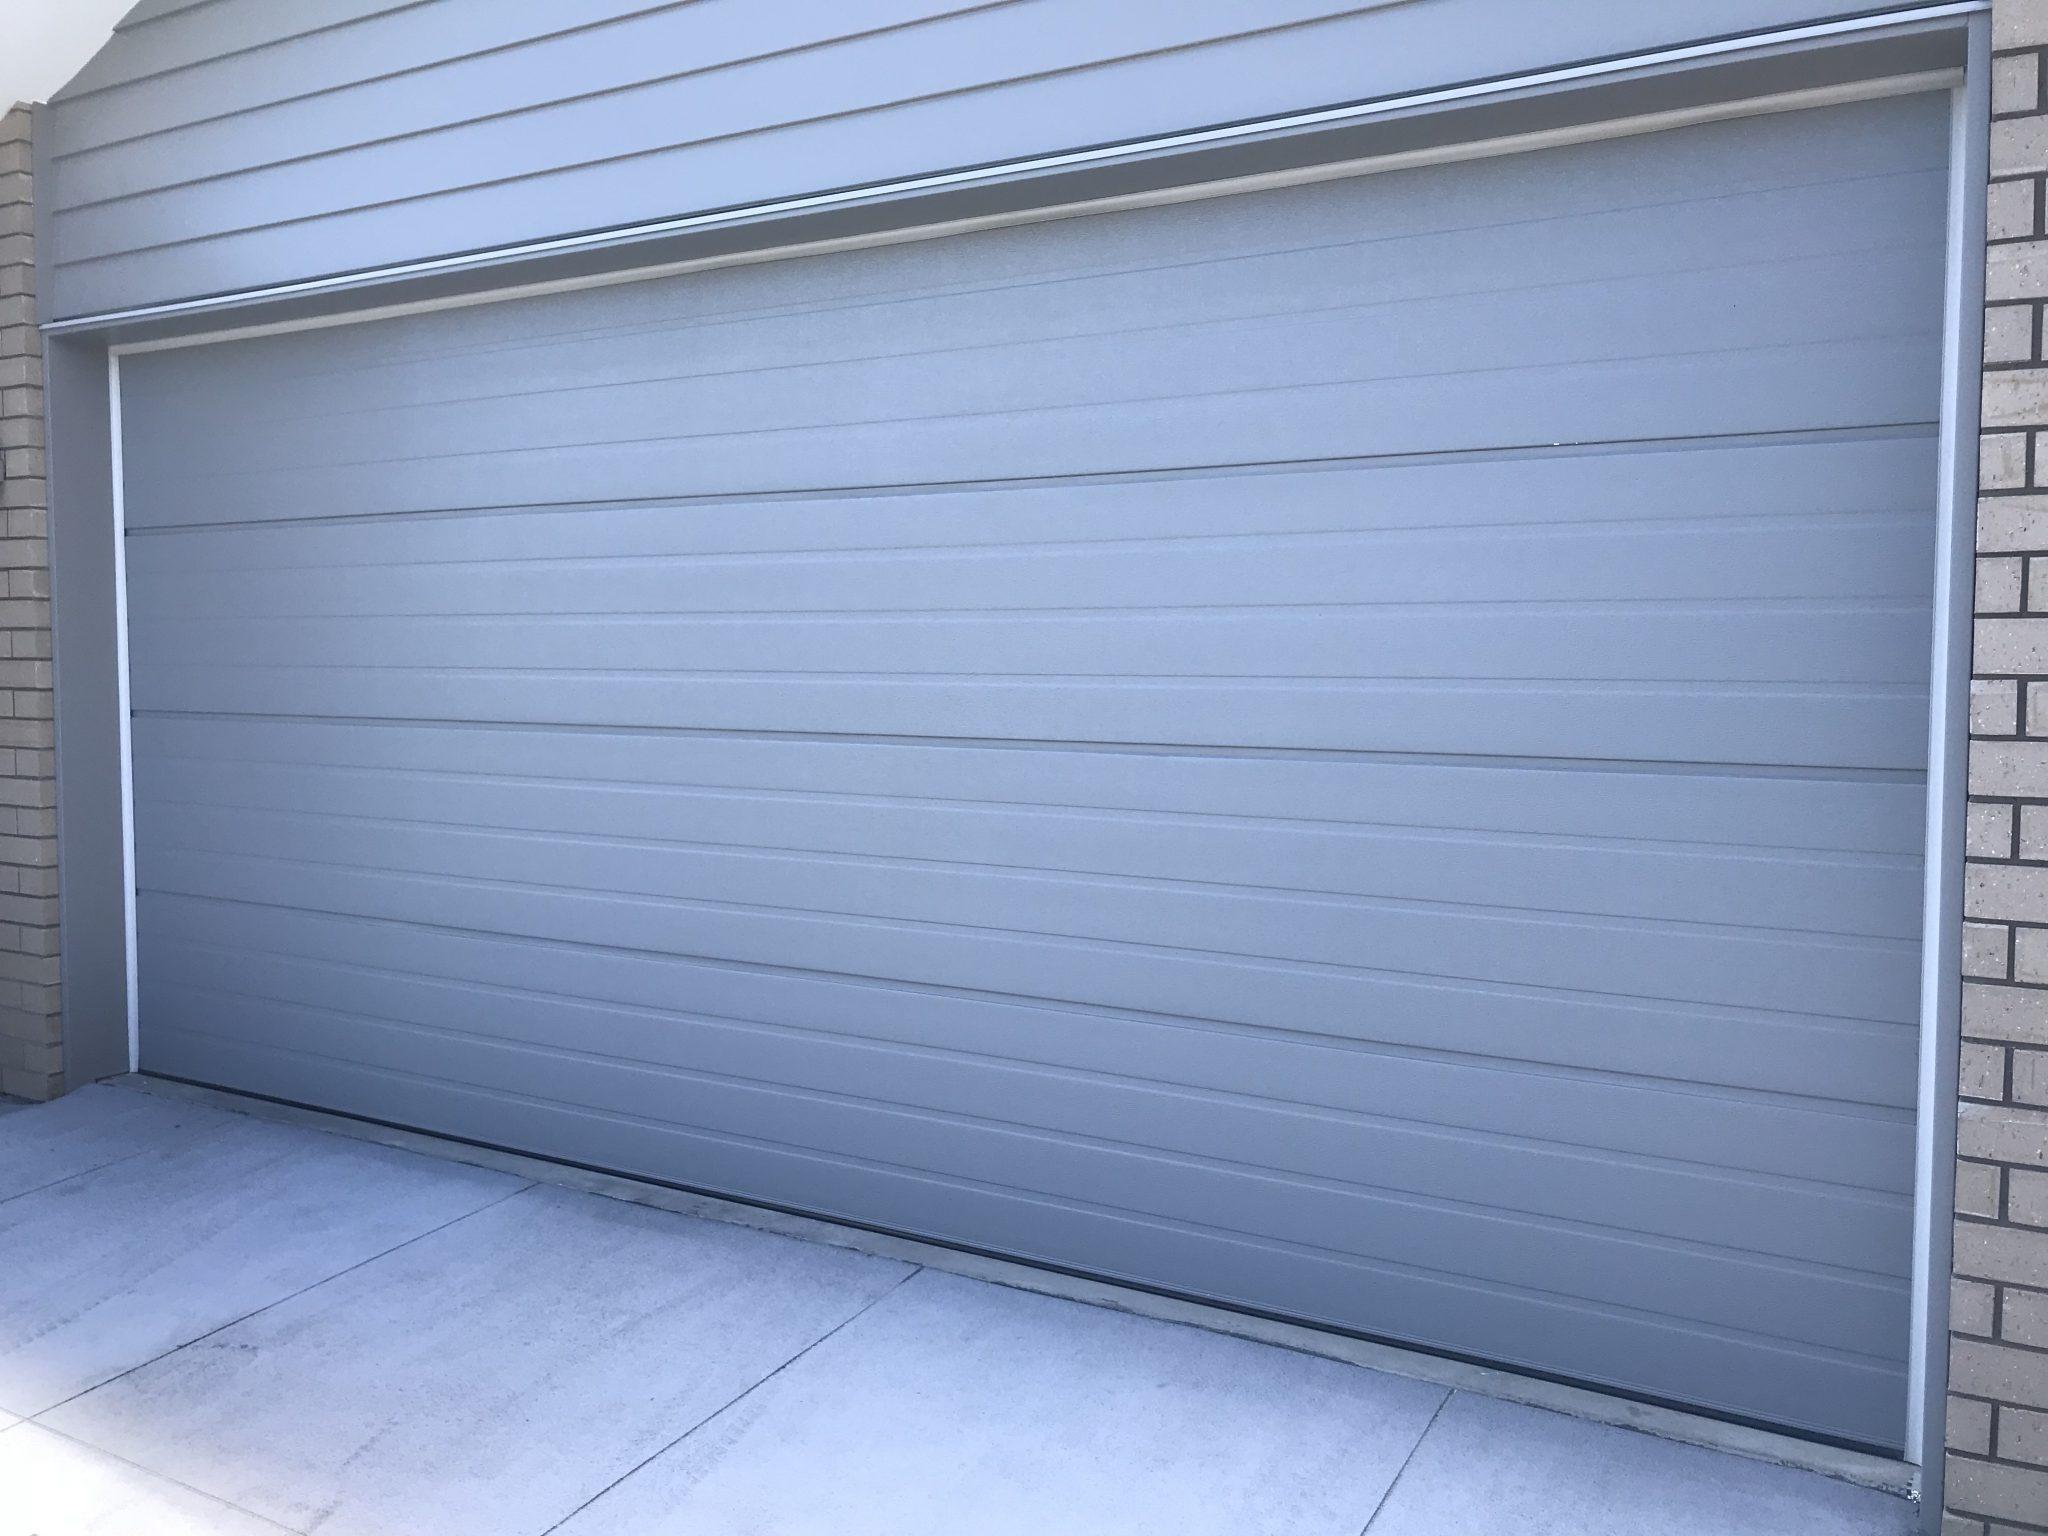 safety door horizontal garage ideas modern folding adeltmechanical doors stainless